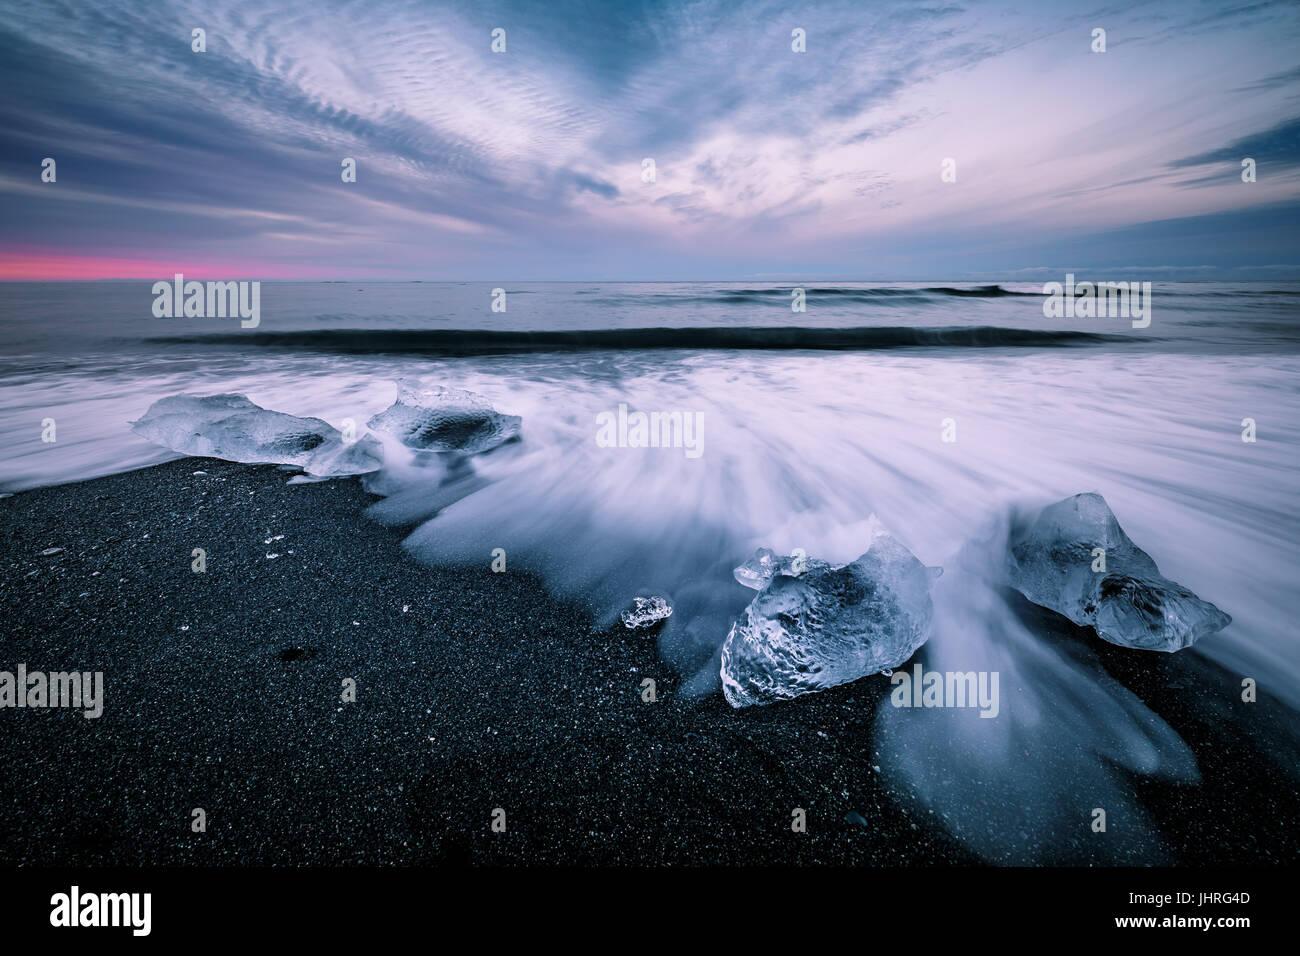 DIamond Beach in Hofn Iceland - Stock Image